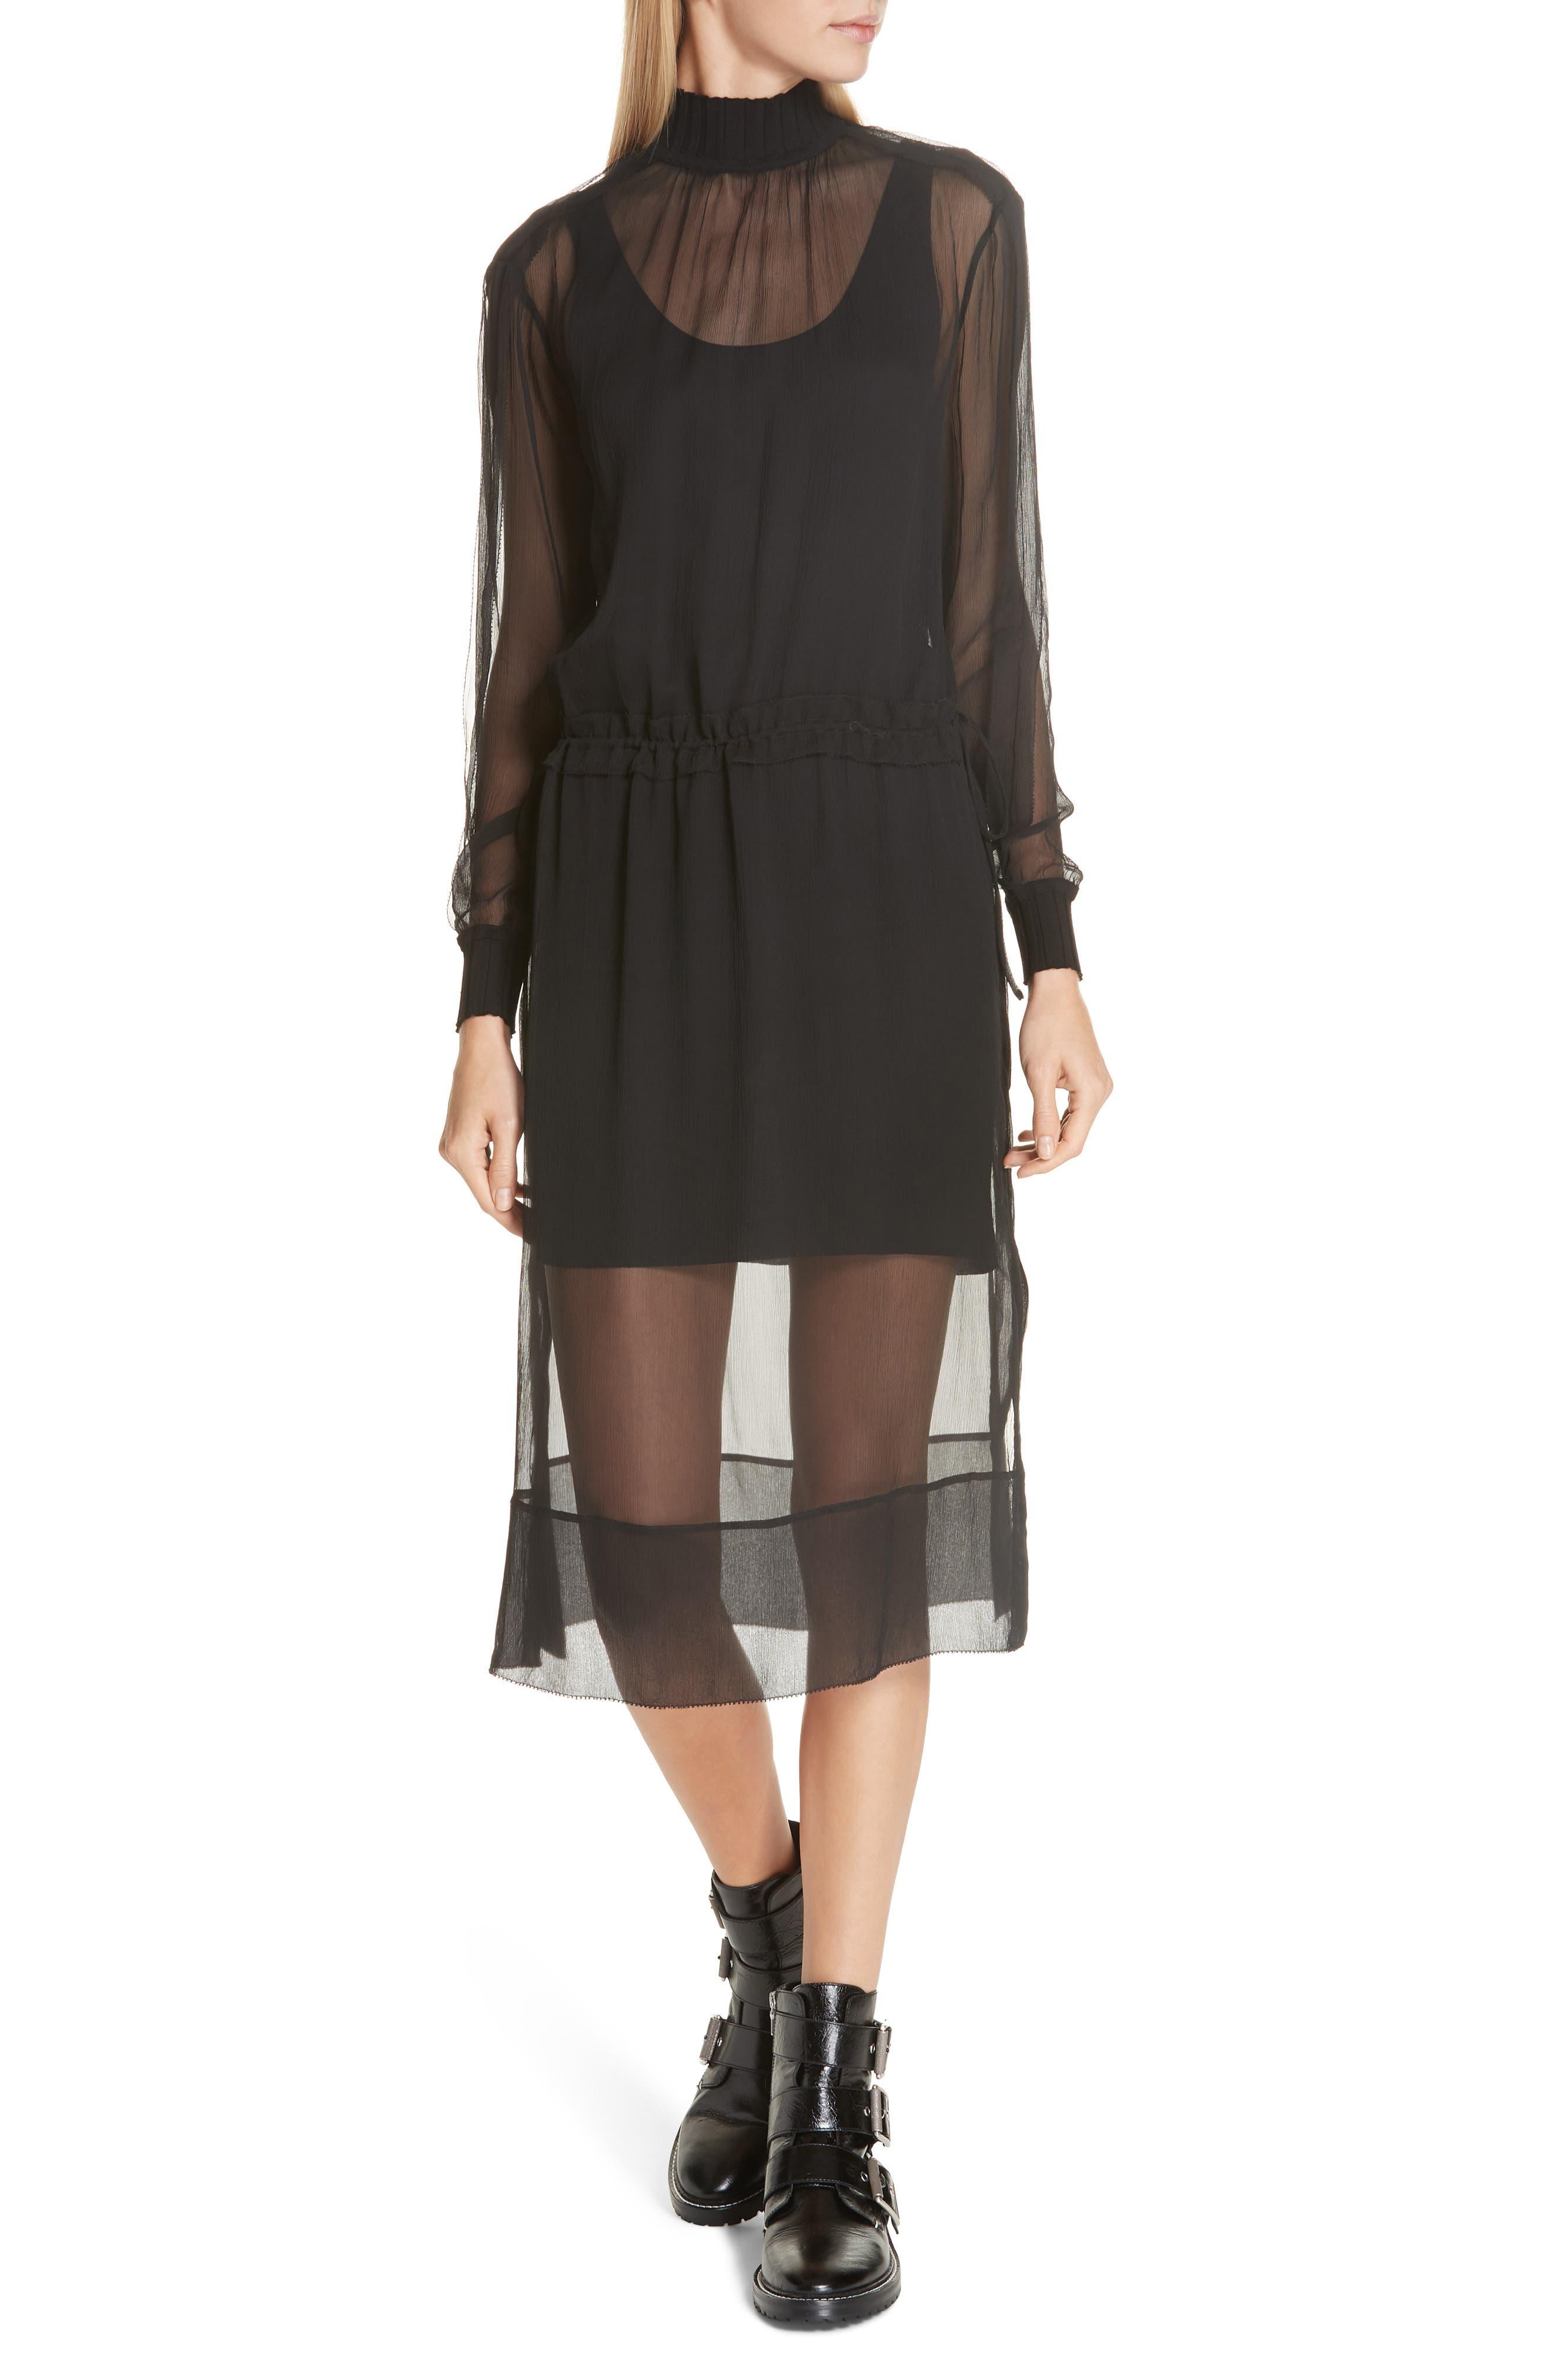 RAG & BONE, Dinah Silk Dress, Main thumbnail 1, color, 001